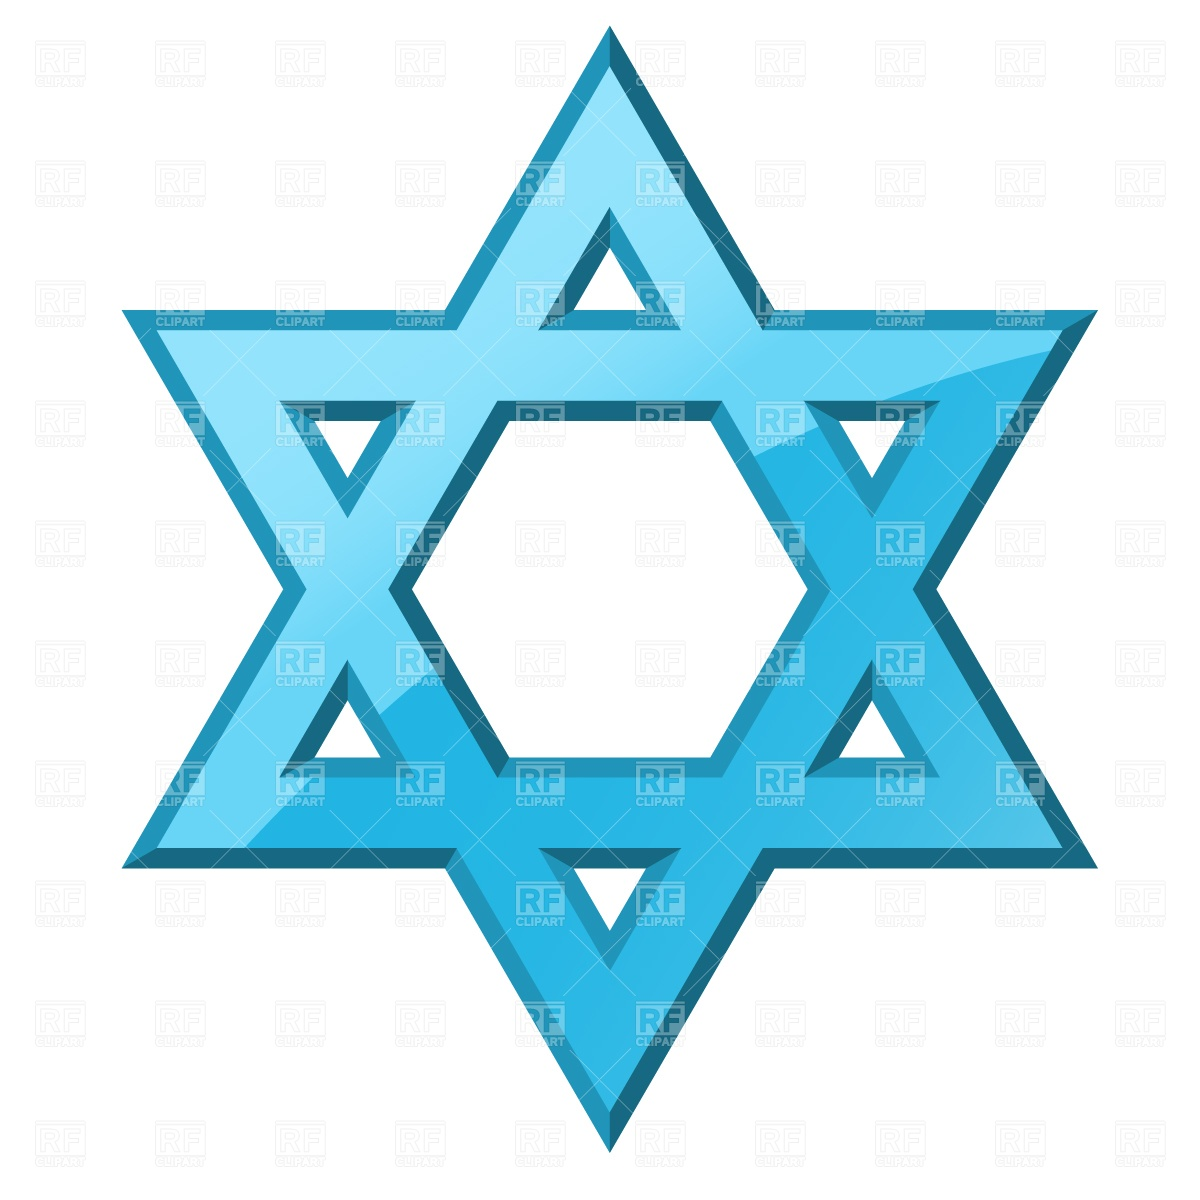 jewish star clipart panda free clipart images rh clipartpanda com Jewish Star Clip Art for Tweets Bar Mitzvah Clip Art